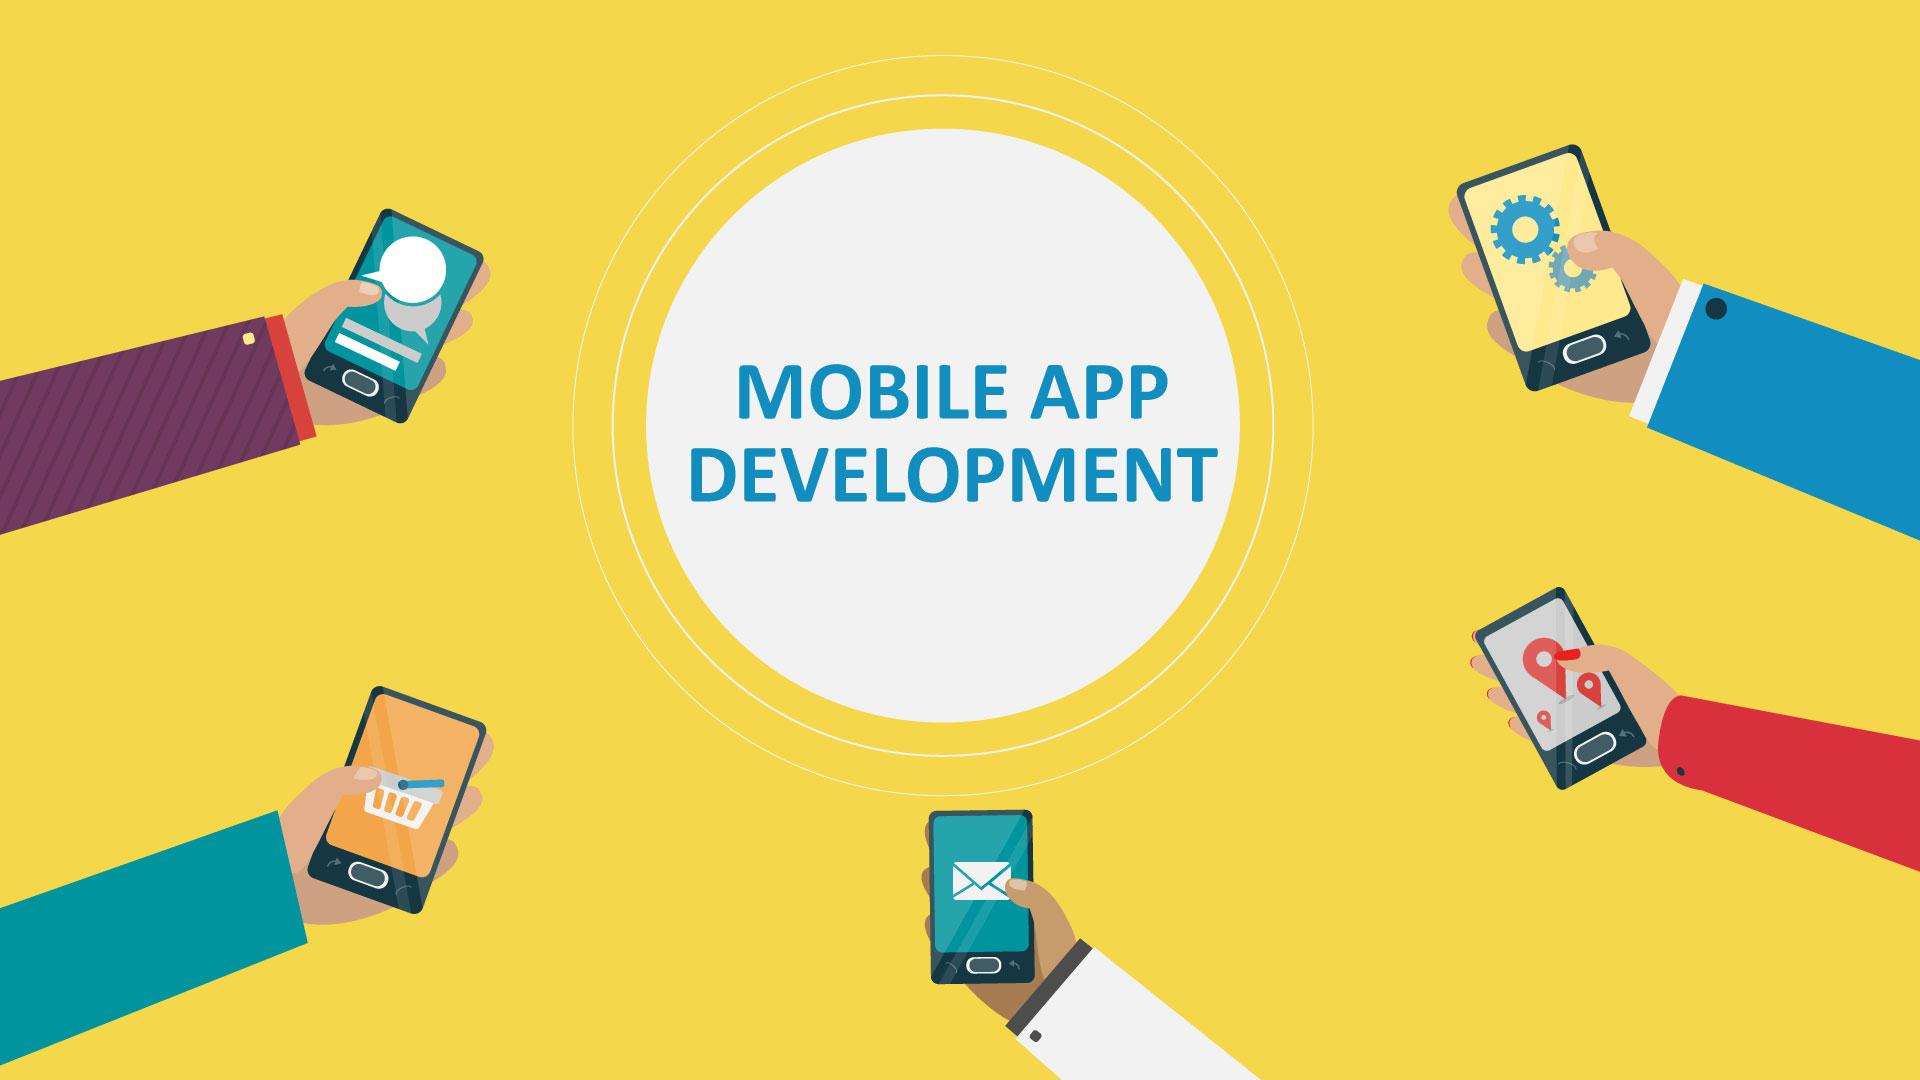 7 Most common problems App Developers faces during Mobile App Development